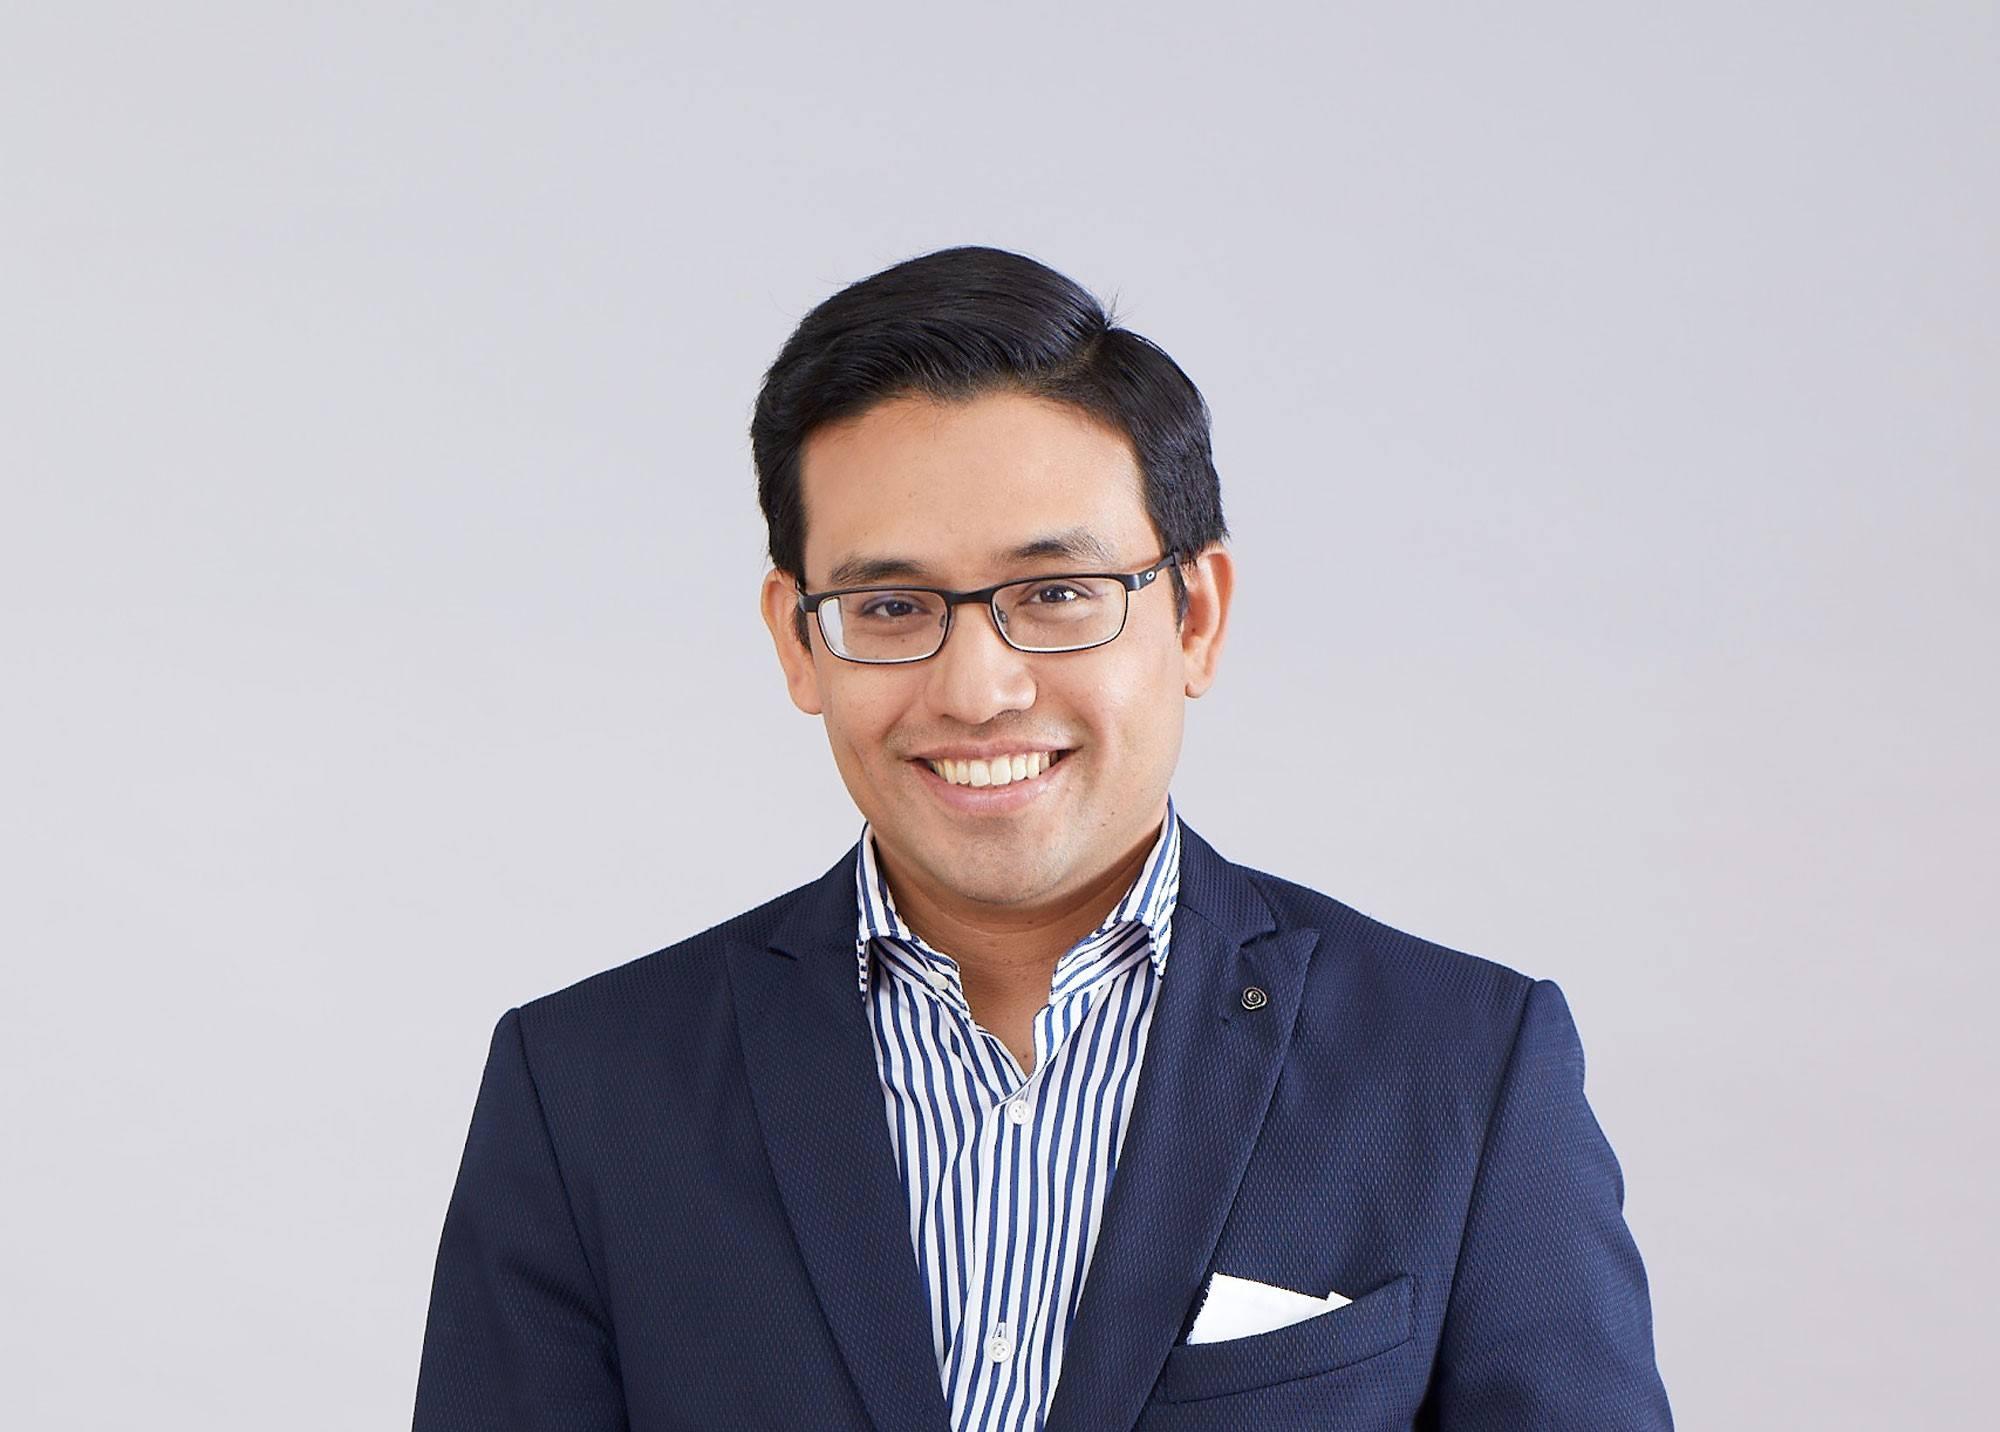 Krungsri announces plans to invest $100m in Thai startups through 2023